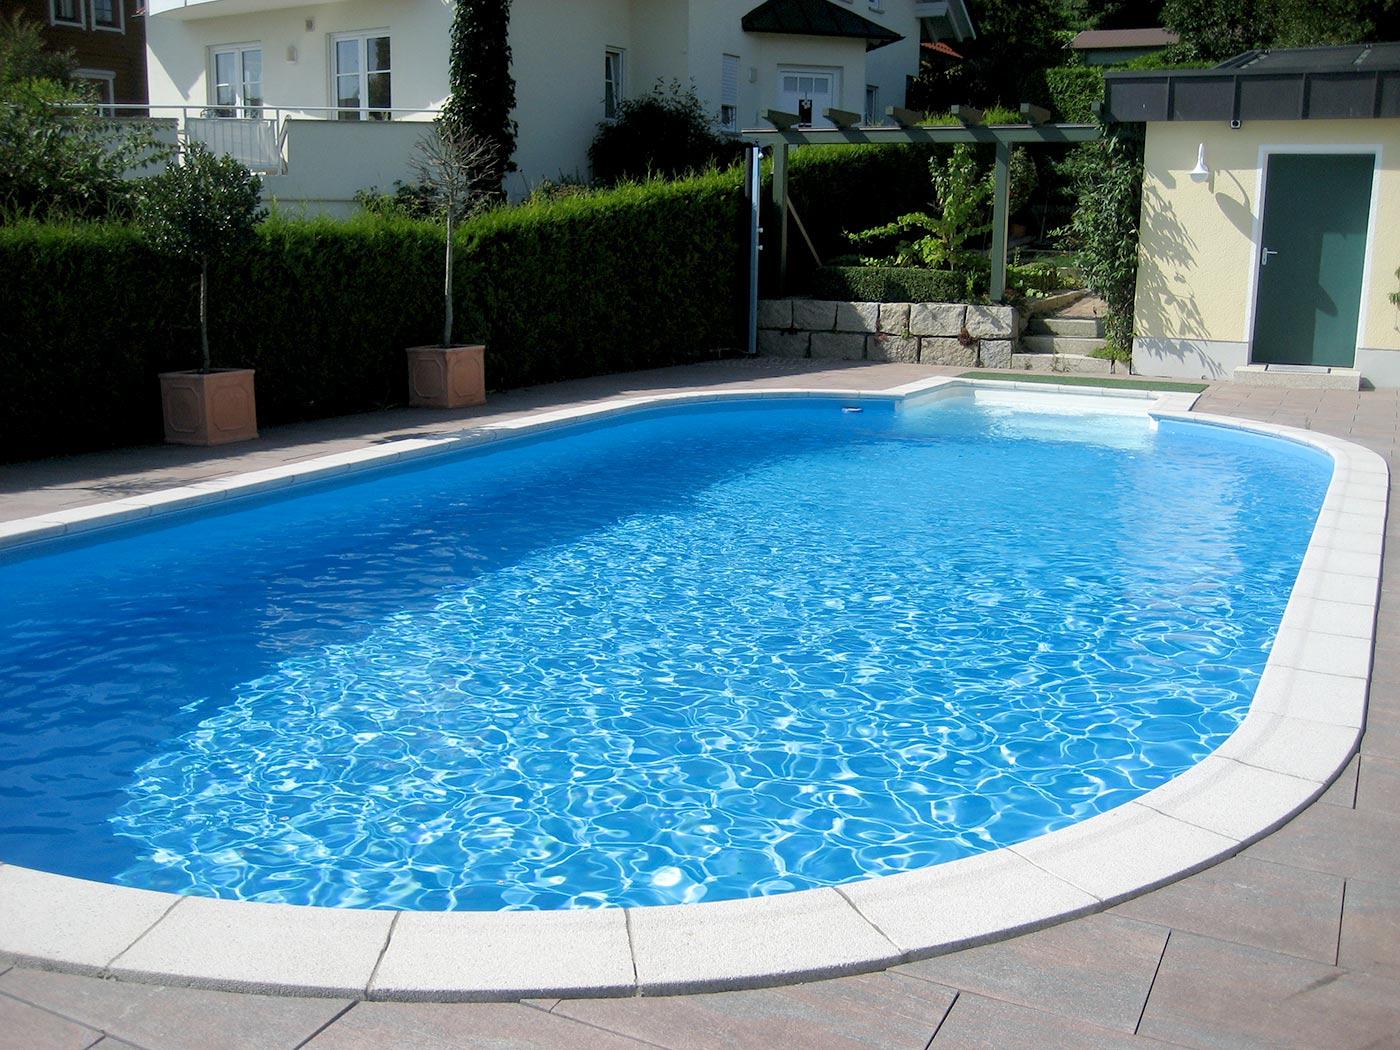 pool stahlwand oval pool oval joy studio design gallery. Black Bedroom Furniture Sets. Home Design Ideas